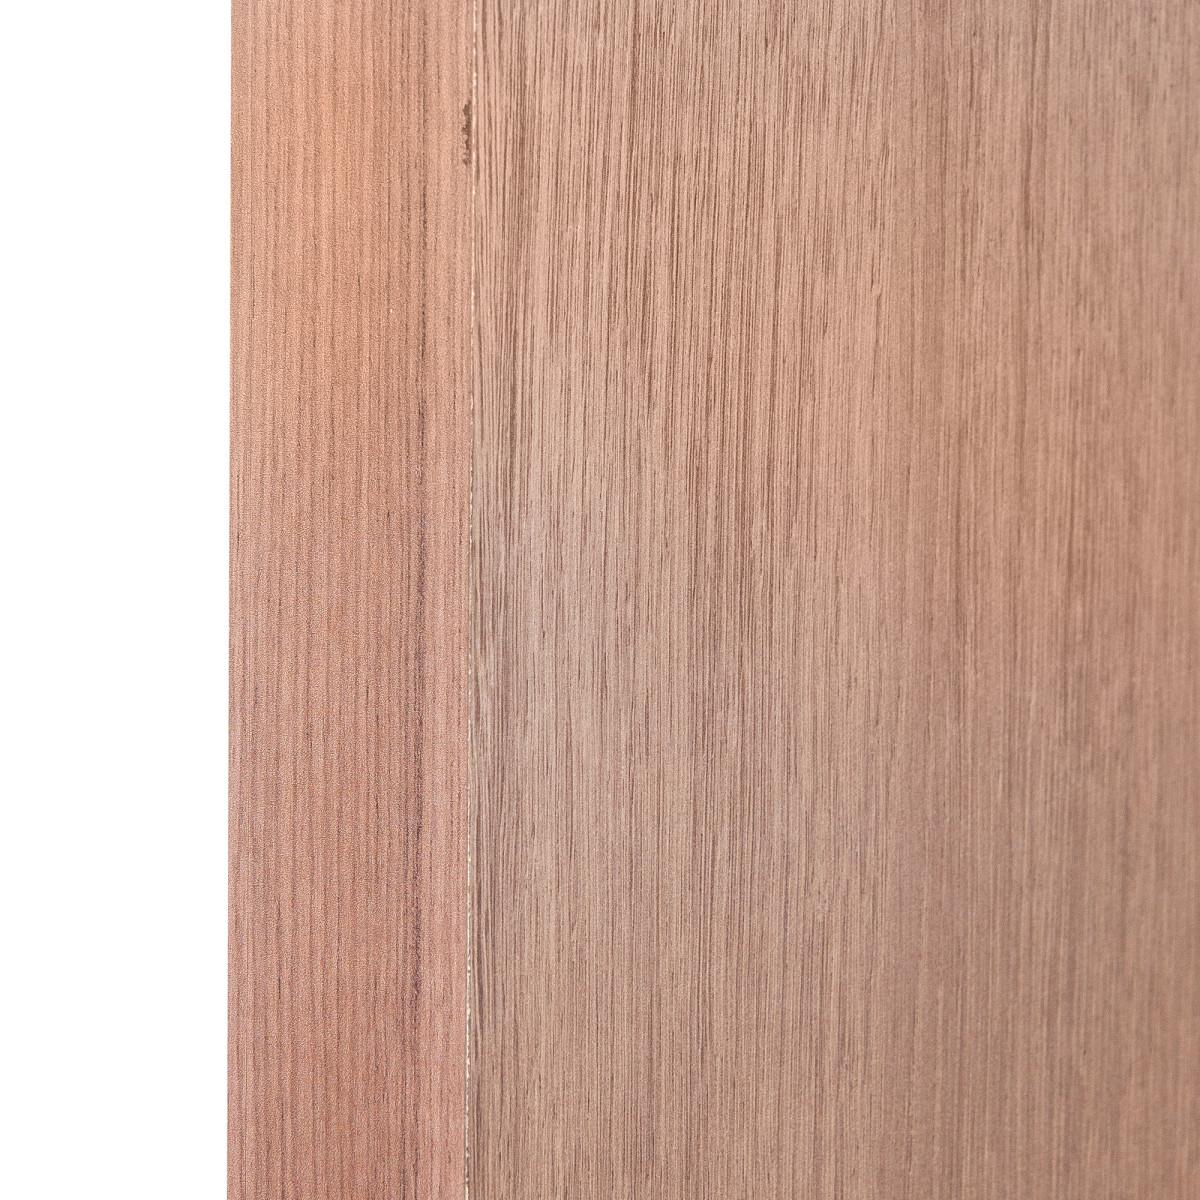 Дверь Межкомнатная Глухая 80x200 Ламинация Цвет Дуб Селект